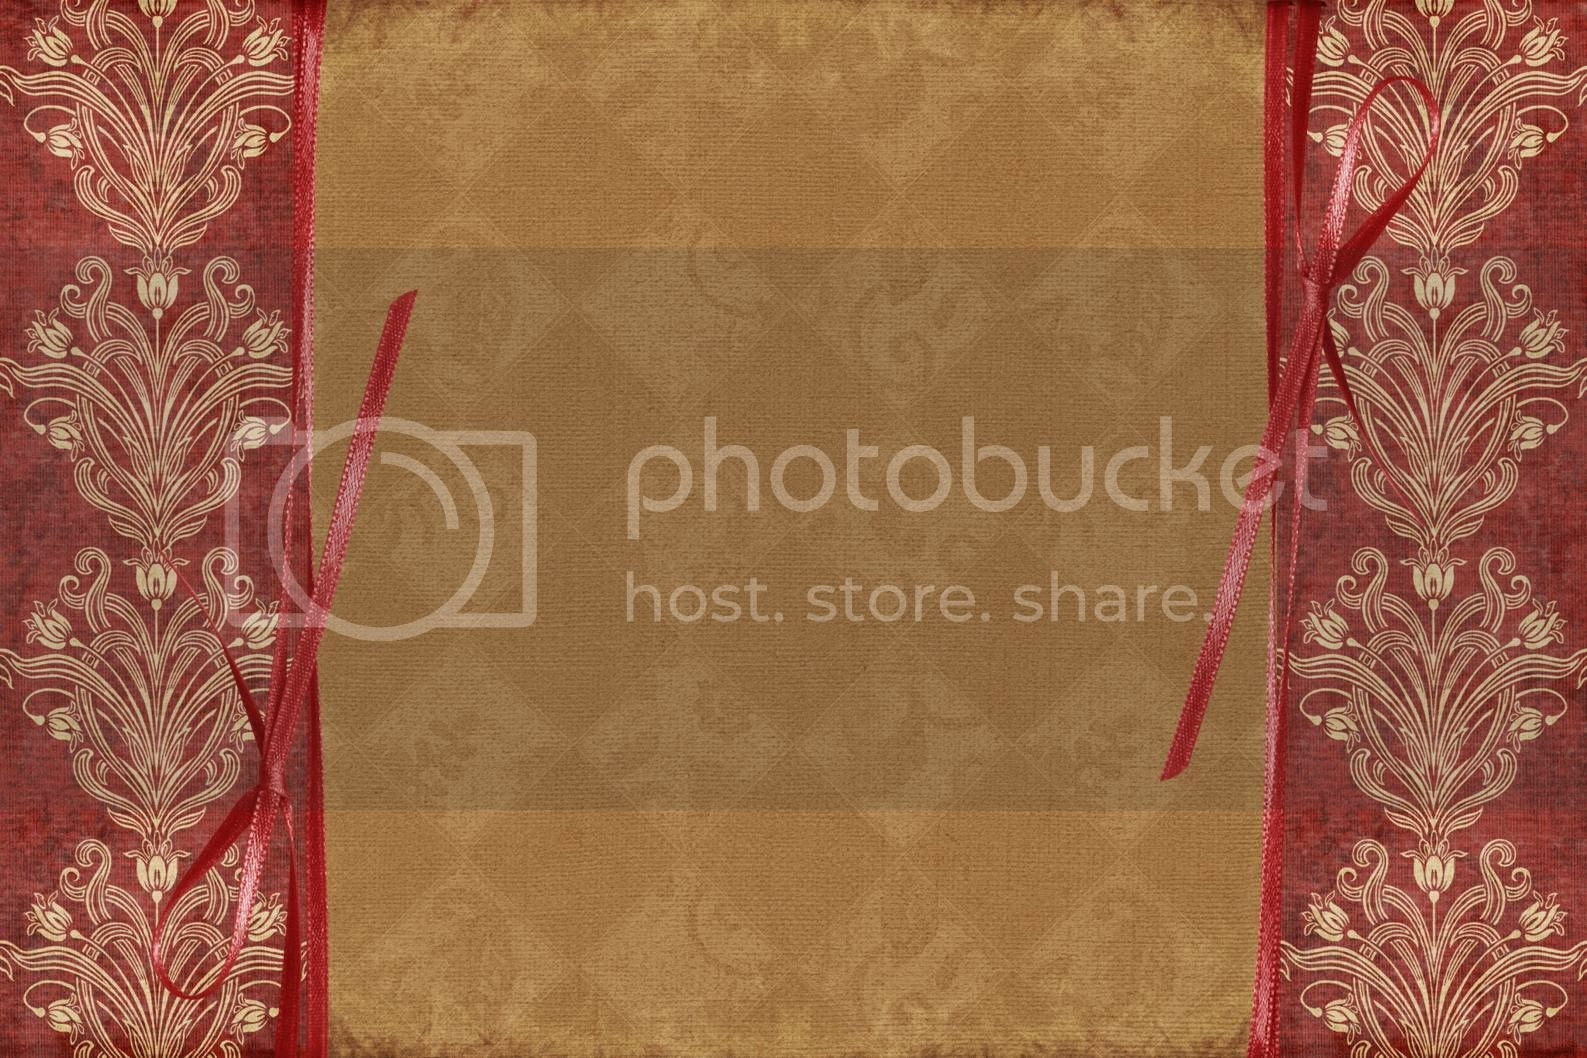 http://thebluebirdhouse.blogspot.com/